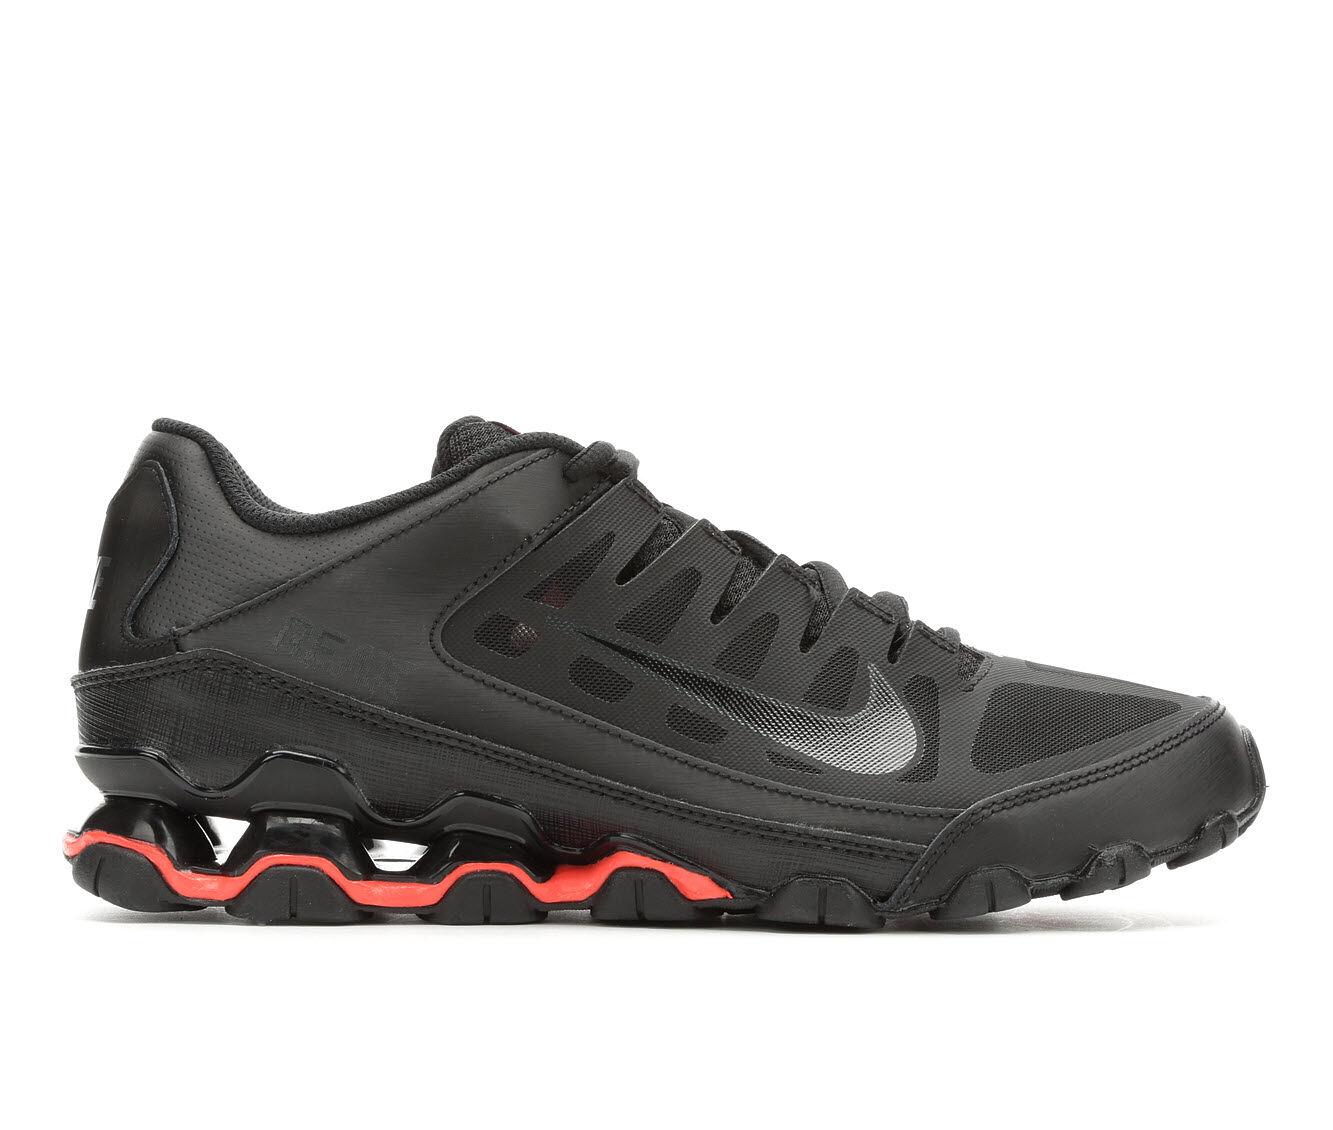 uk shoes_kd0985